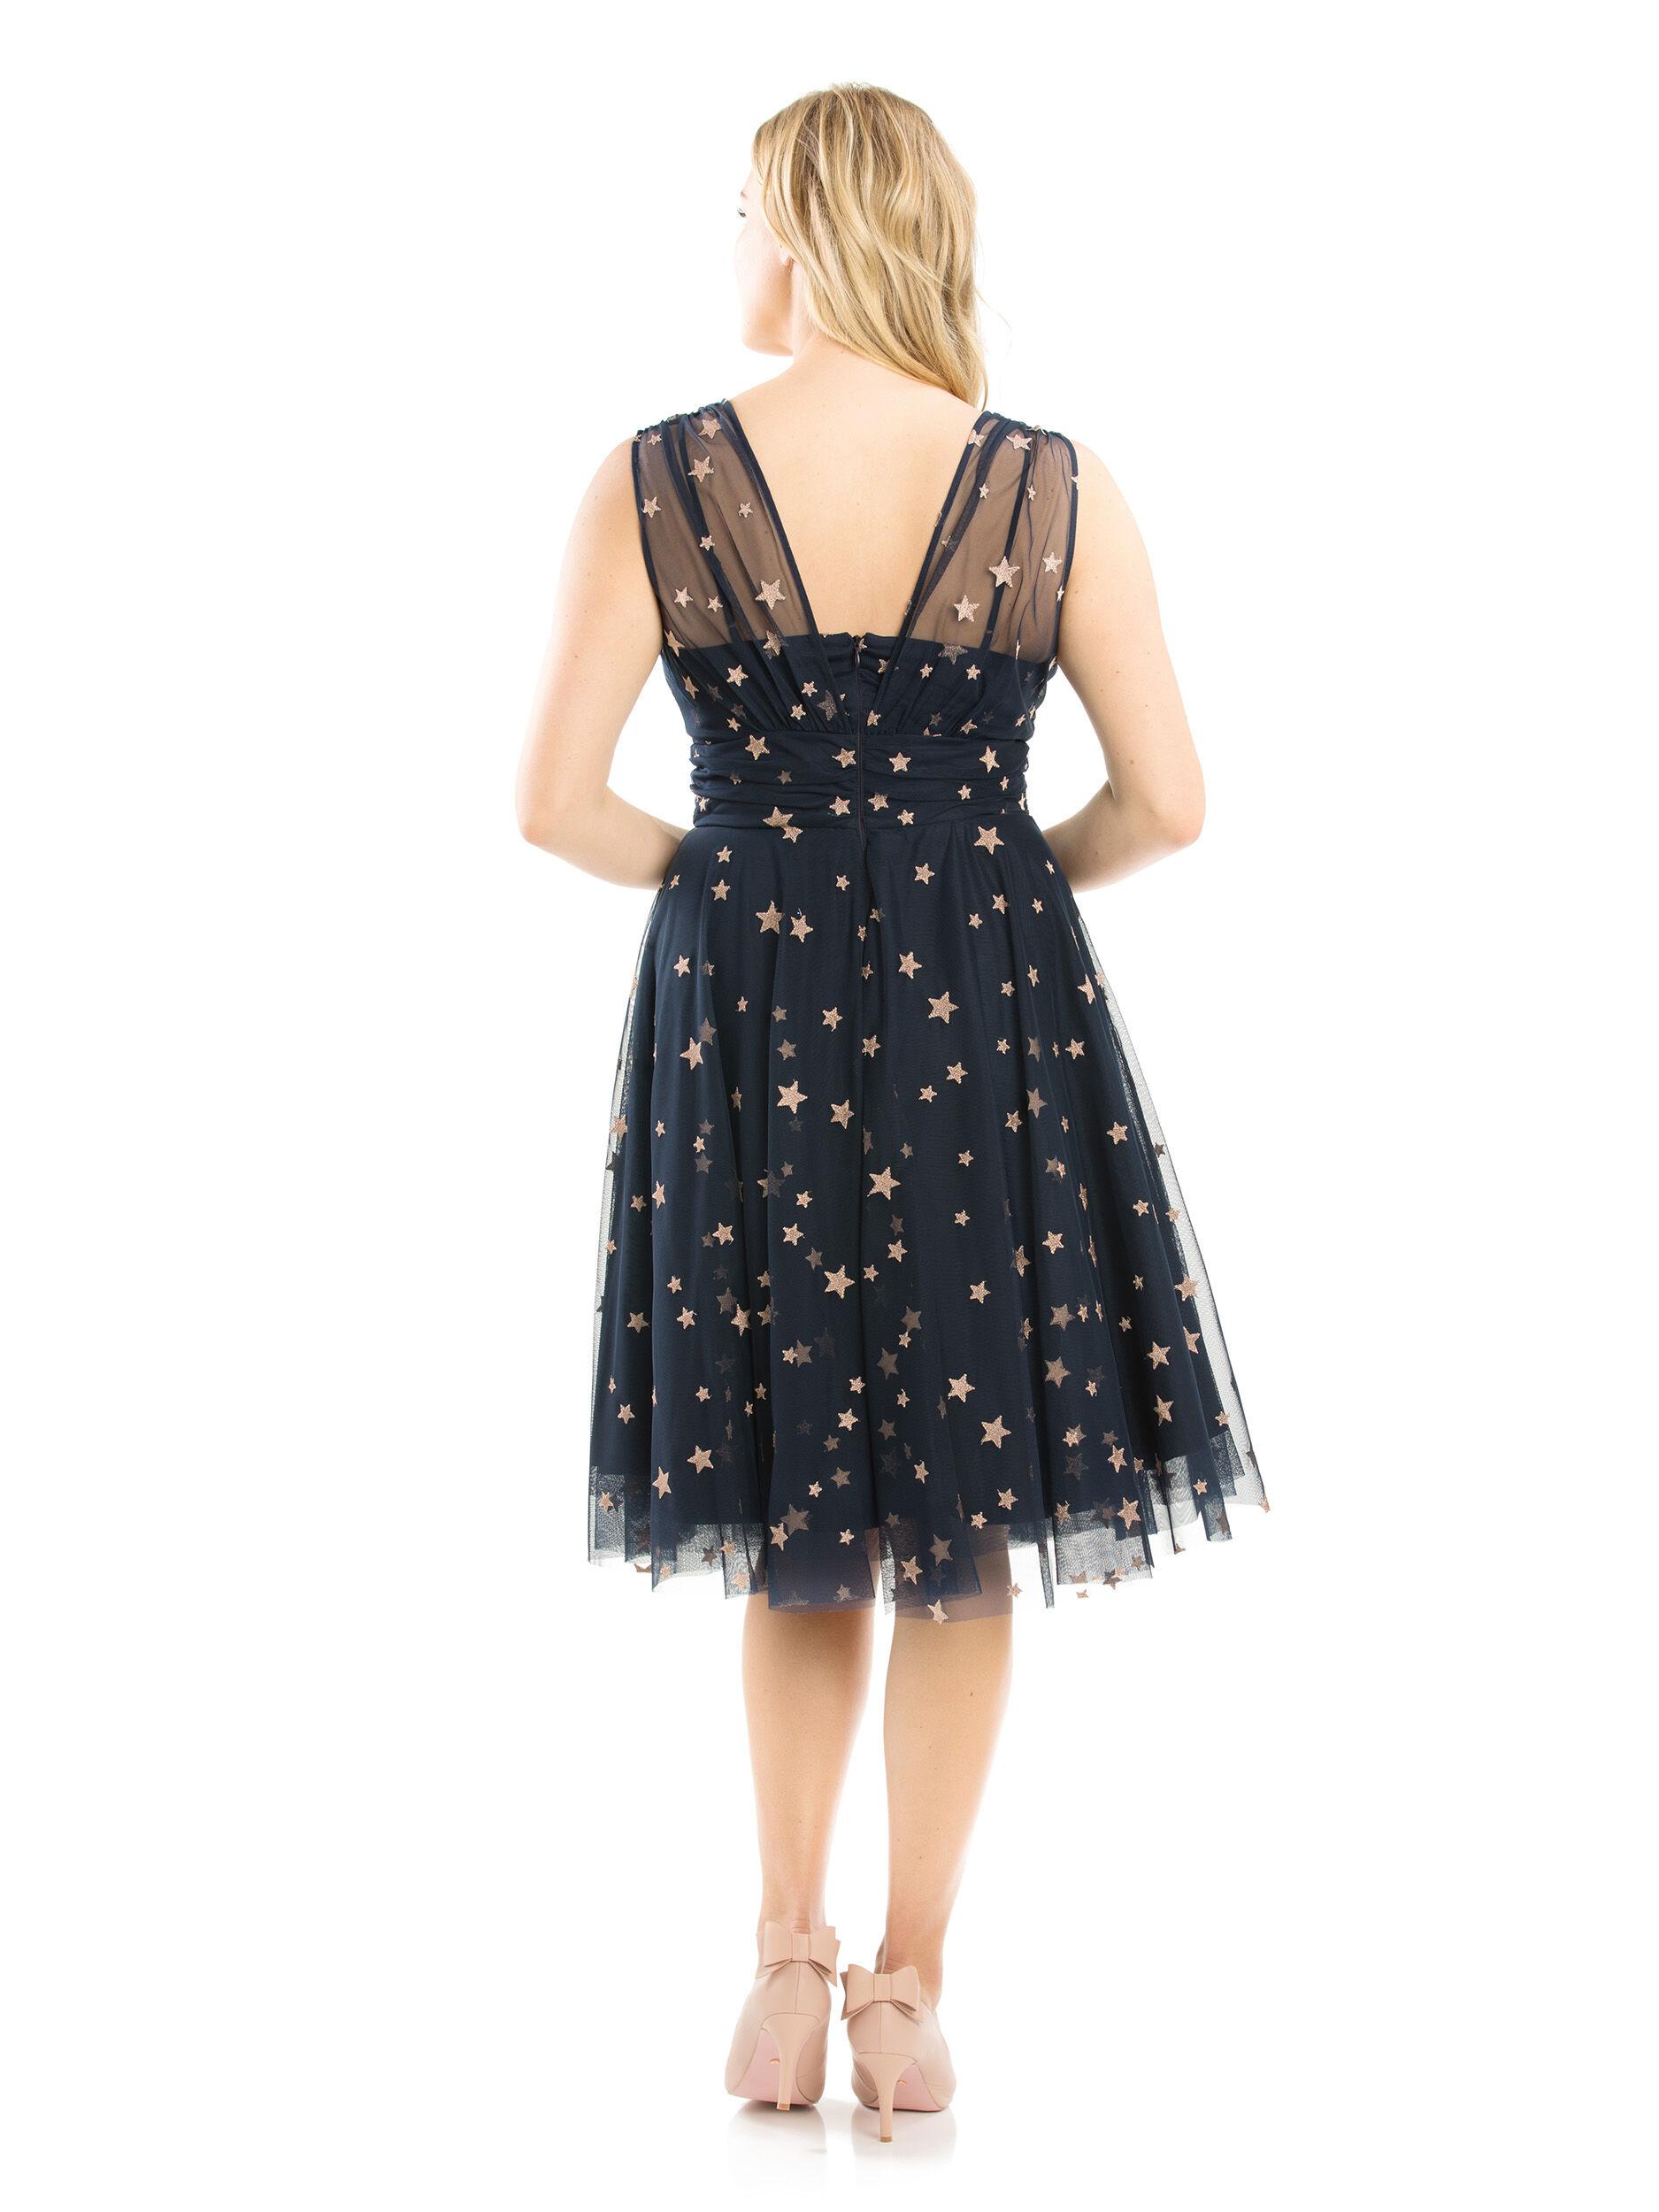 Wish Upon A Star Dress